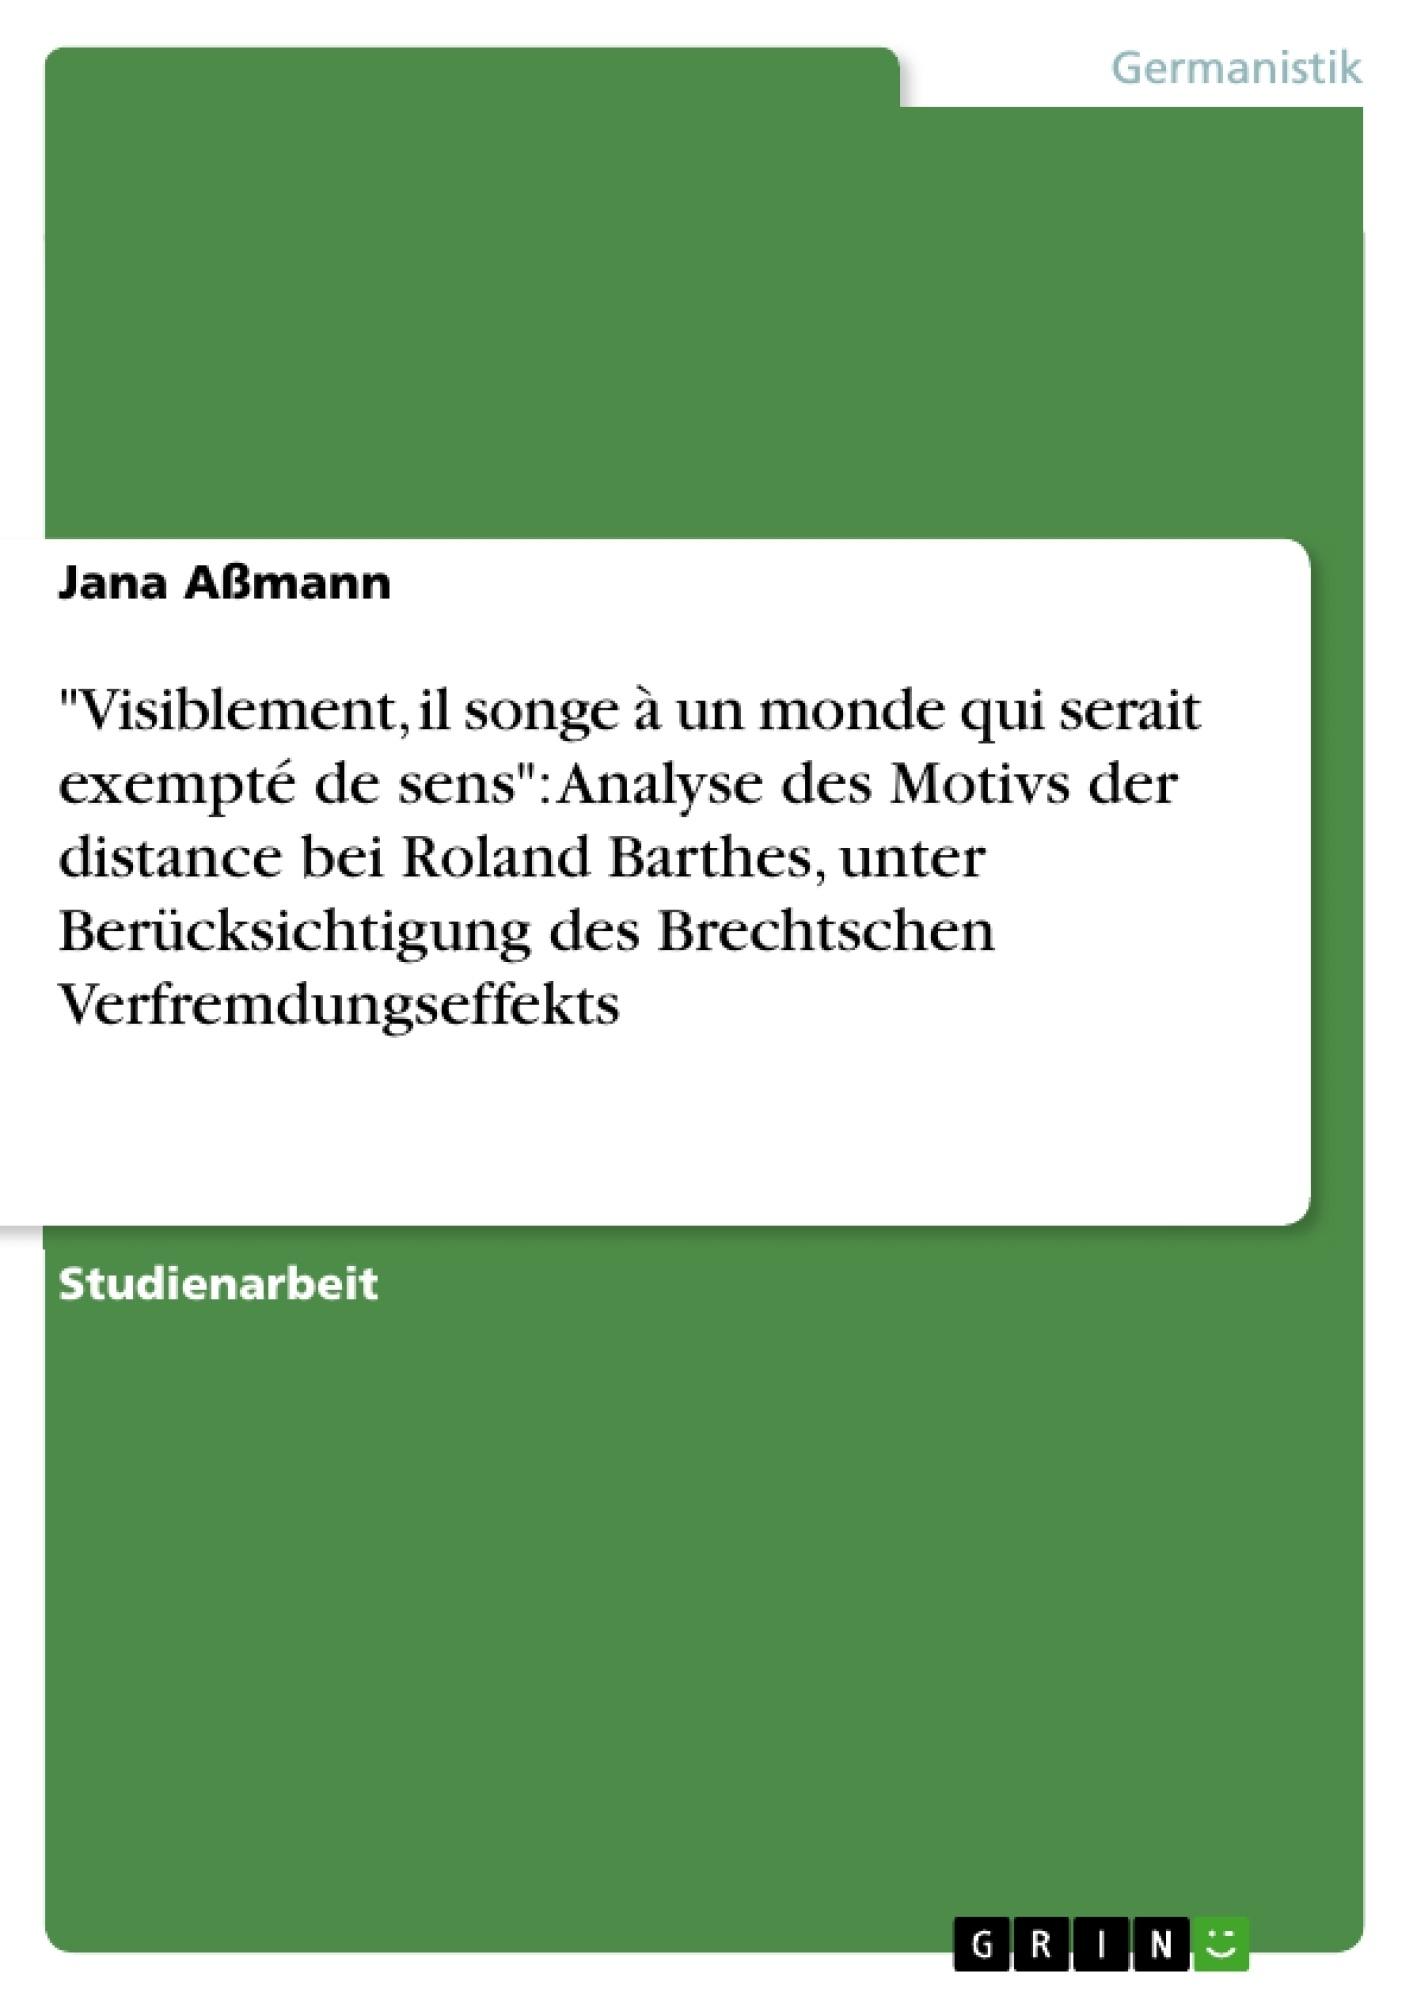 "Titel: ""Visiblement, il songe à  un monde qui serait exempté de sens"": Analyse des Motivs der distance bei Roland Barthes, unter Berücksichtigung des Brechtschen Verfremdungseffekts"